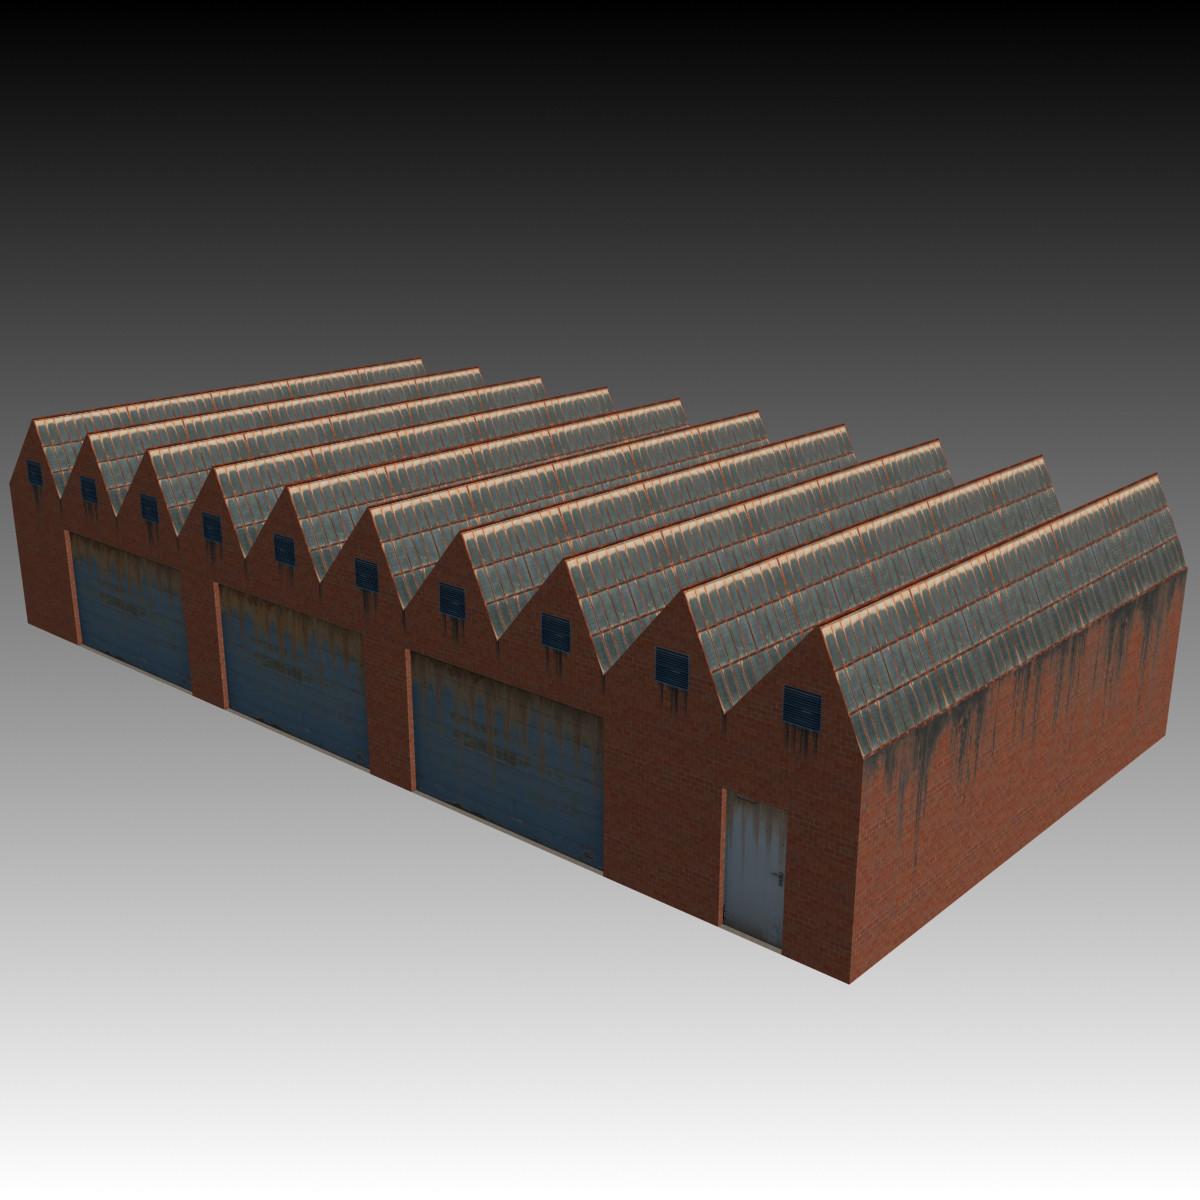 3d model of factory building 2